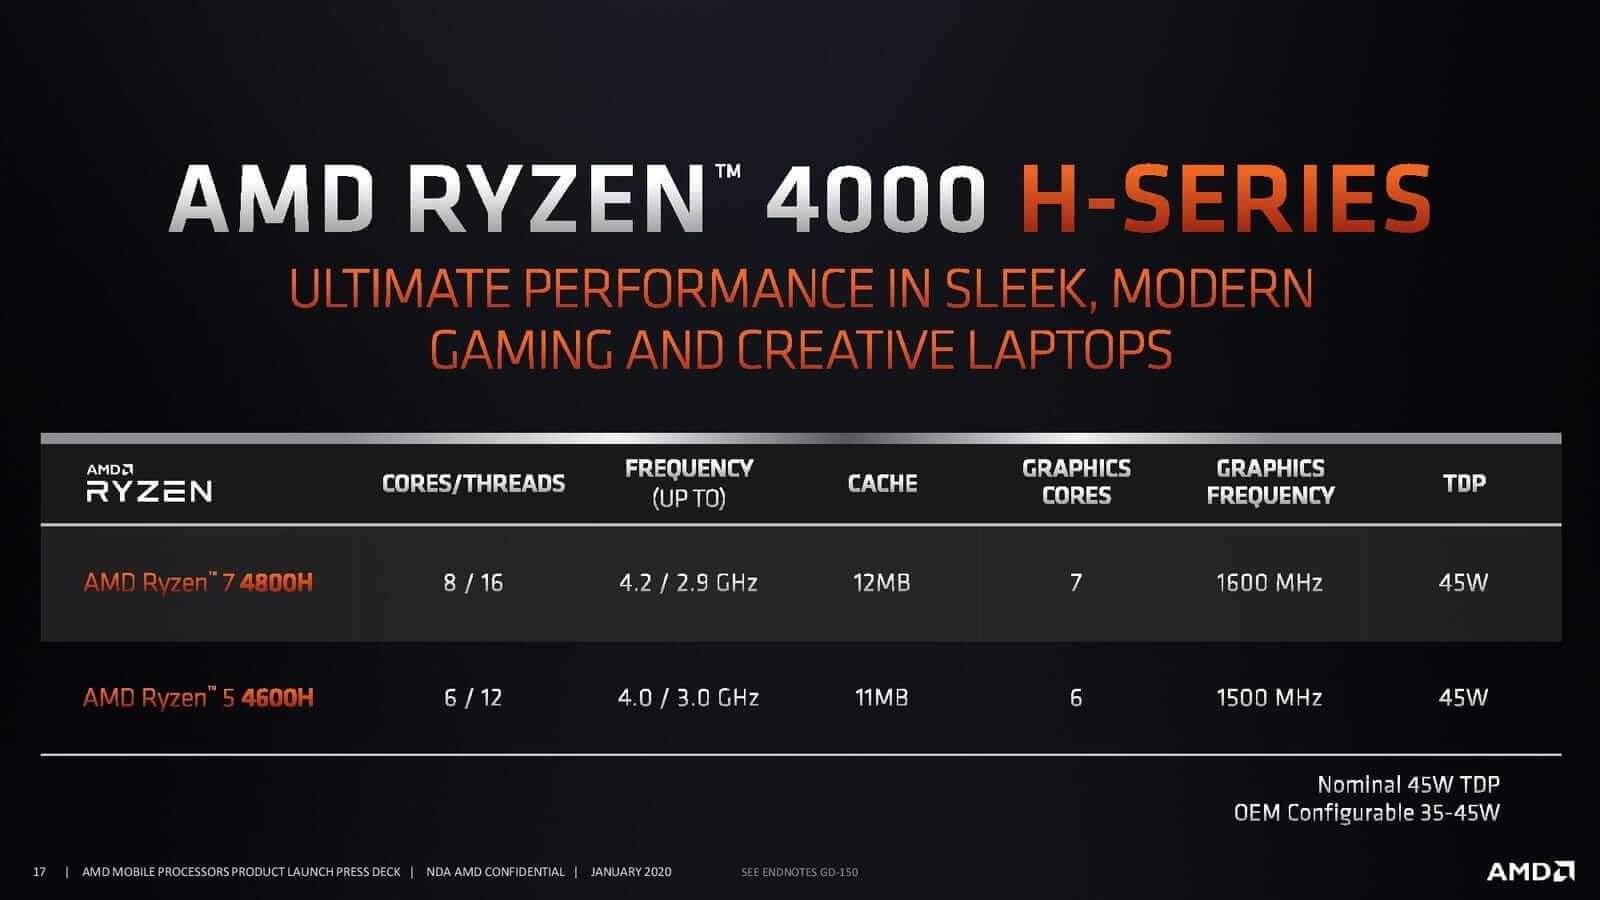 Ryzen 4000 H Series